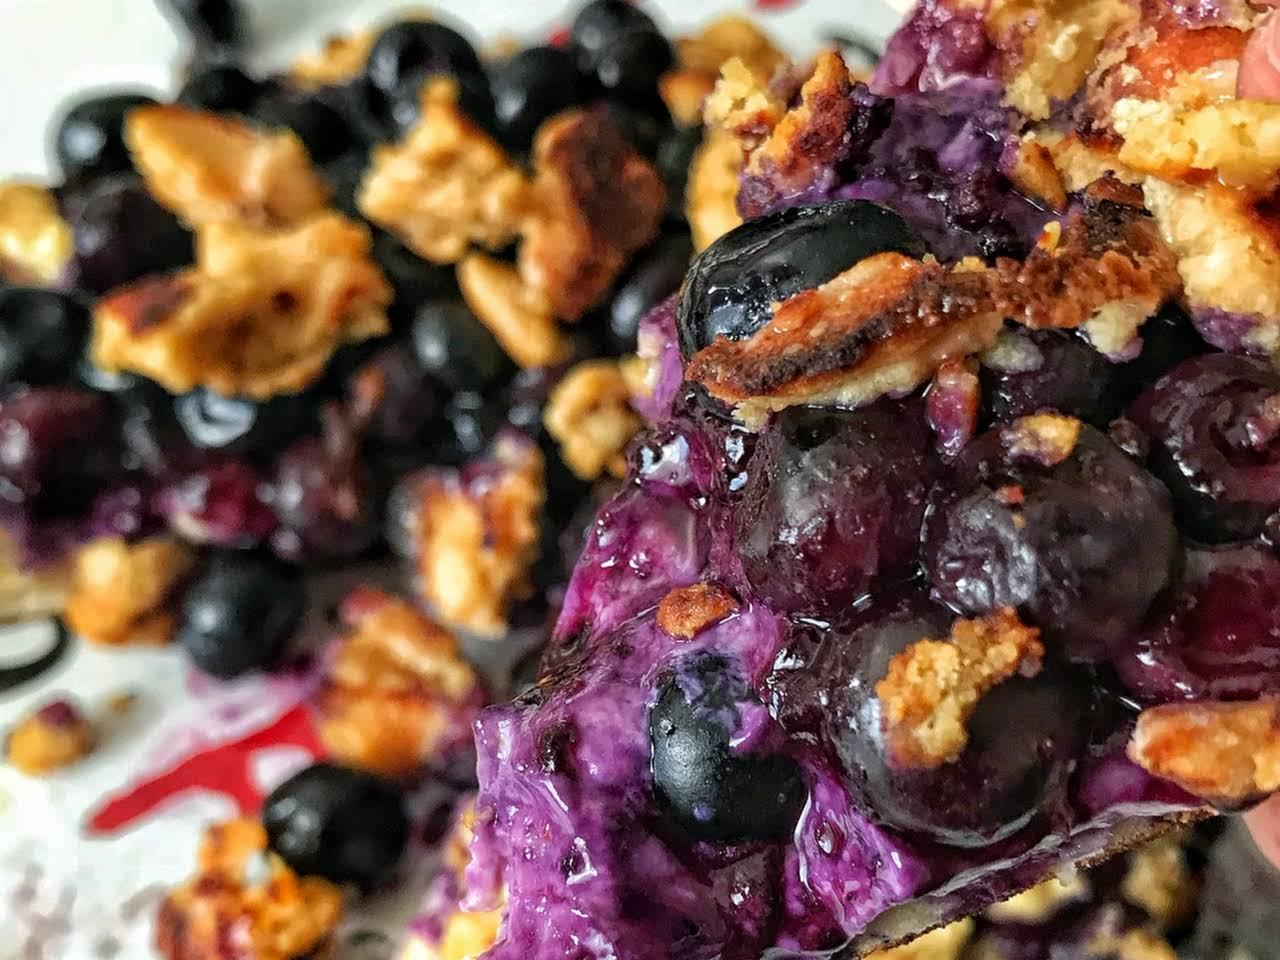 blueberry dessert recipes low calorie Low Calorie Blueberry Dessert Skillet Pizza